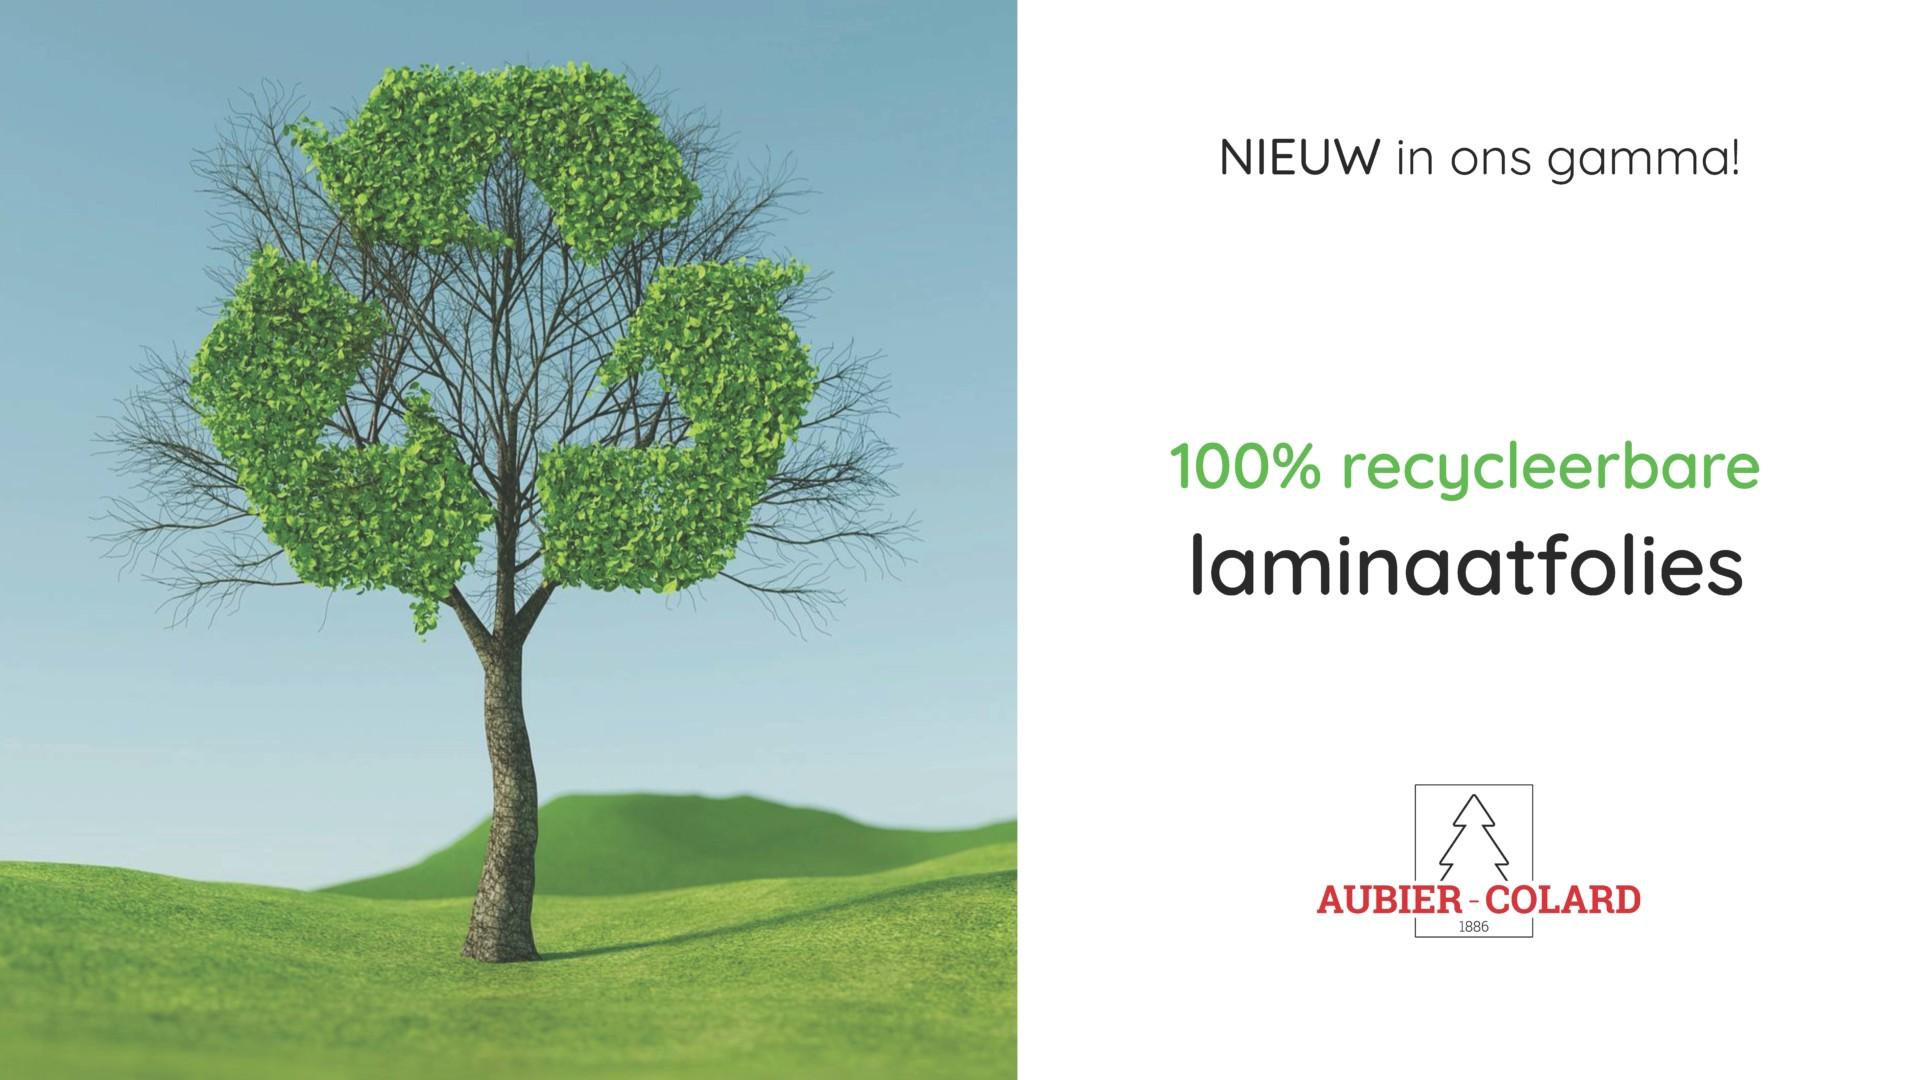 Recycleerbare laminaatfolies